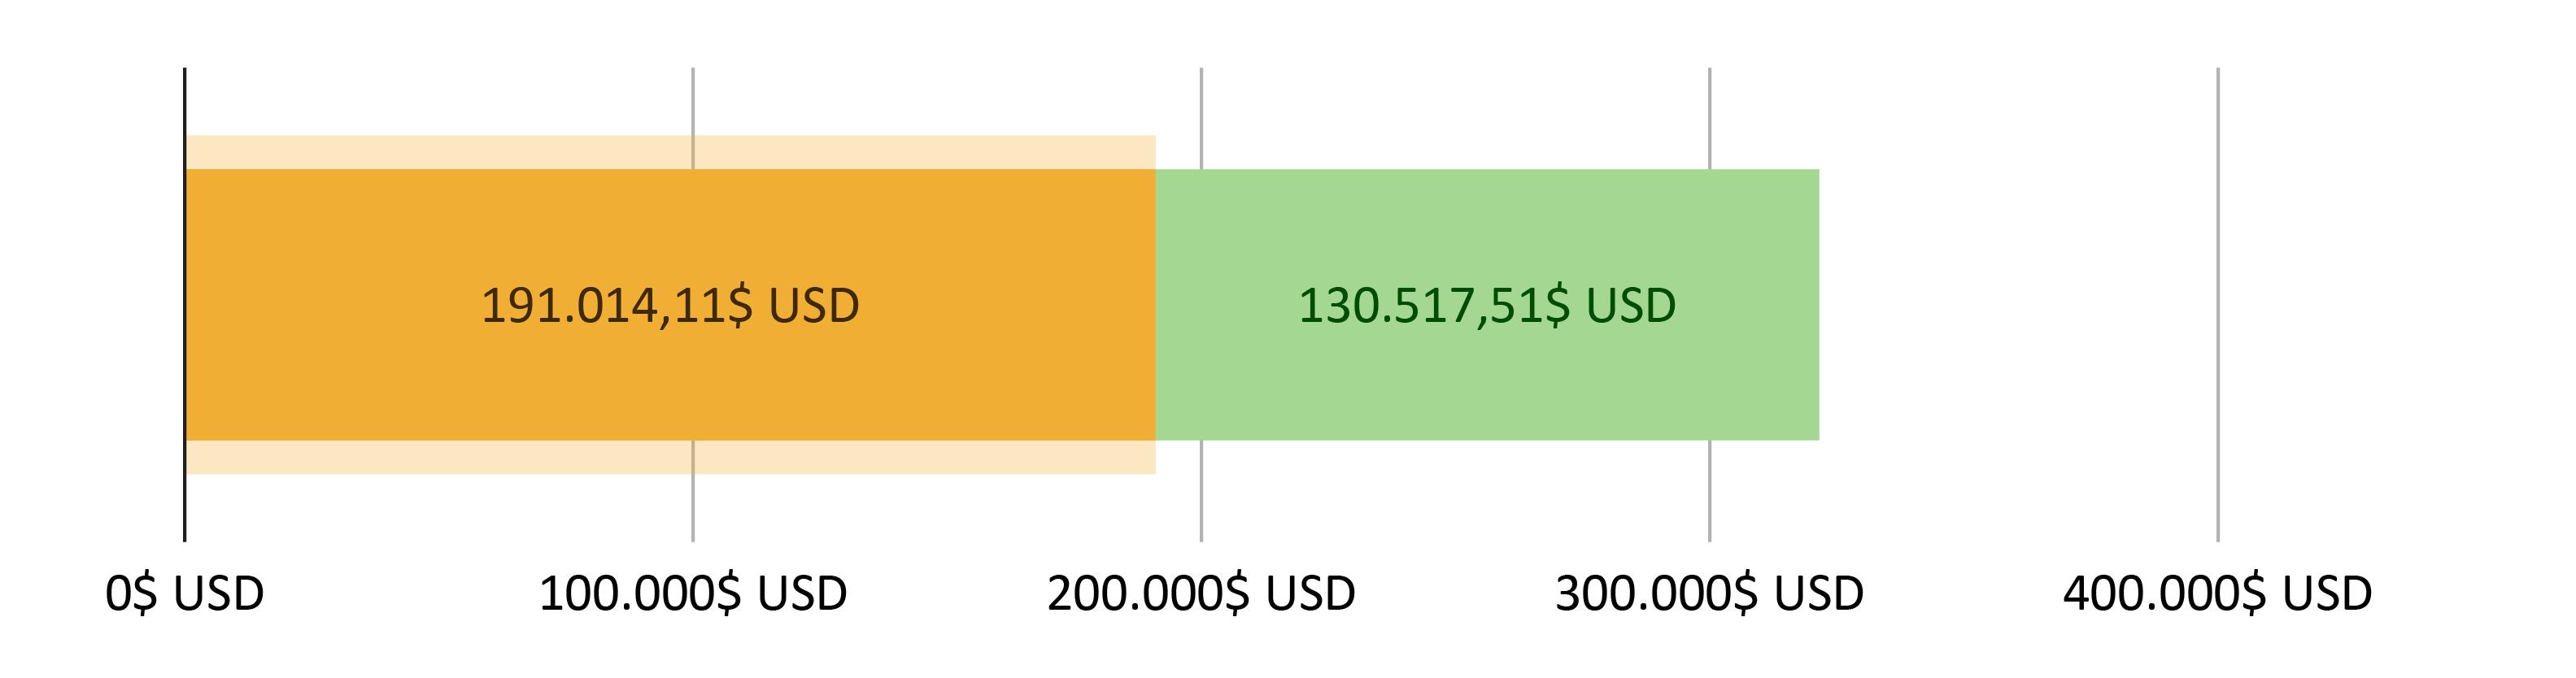 191.014,11$ USD donați; 130.517,51$ USD rămași